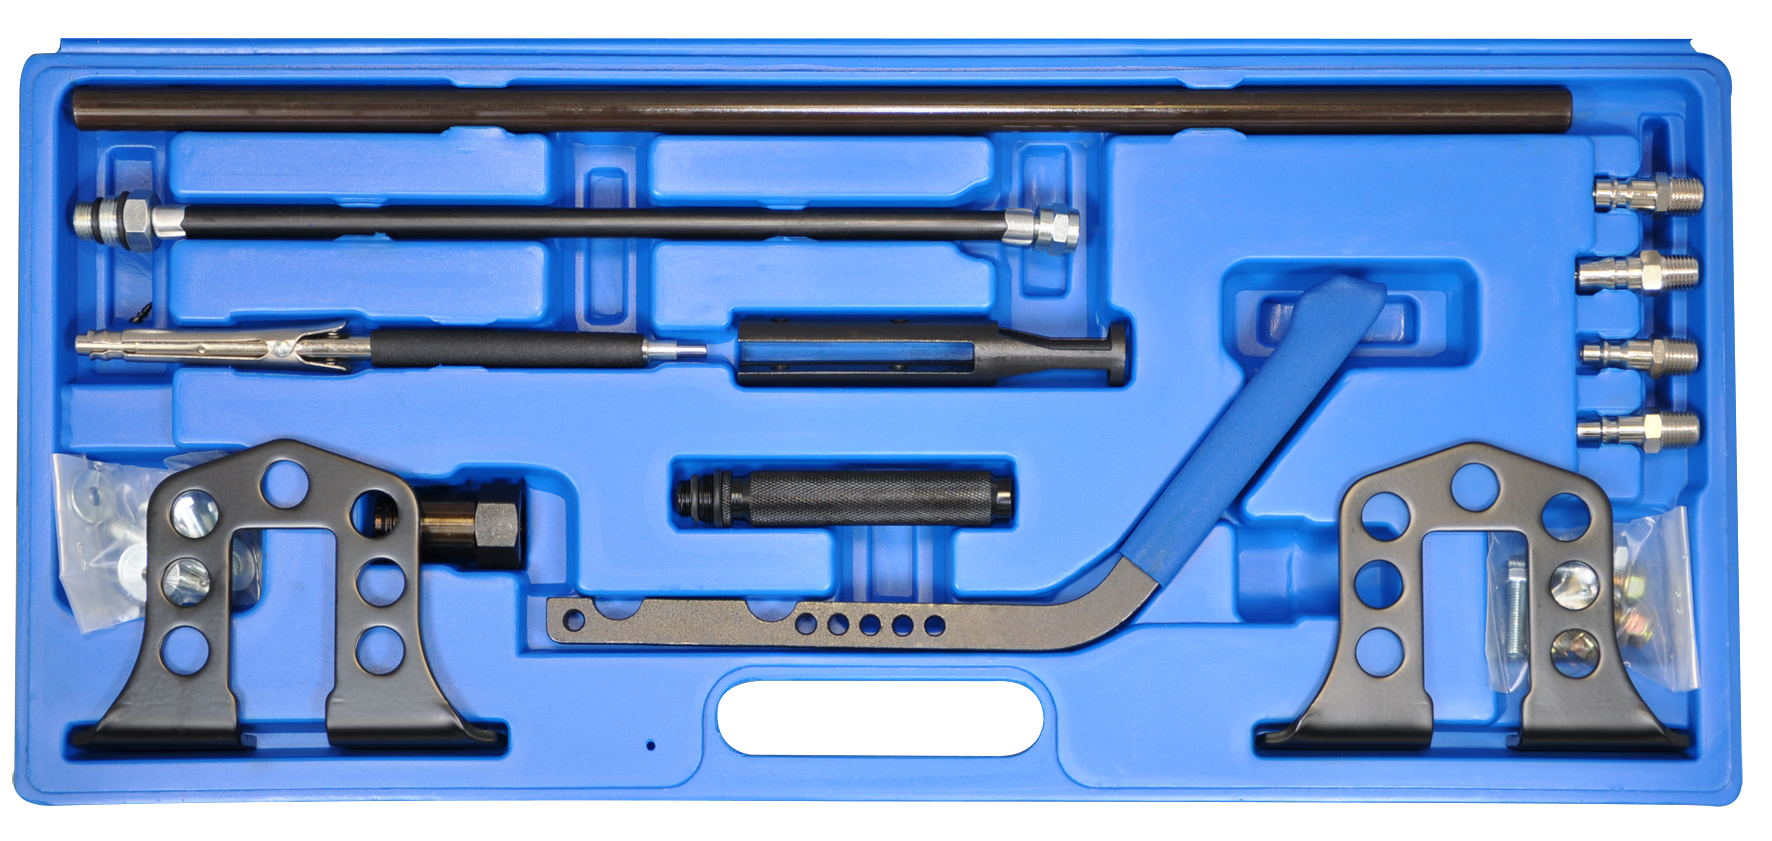 SWSTAHL Valve spring fitting set, 13-piece 08650L